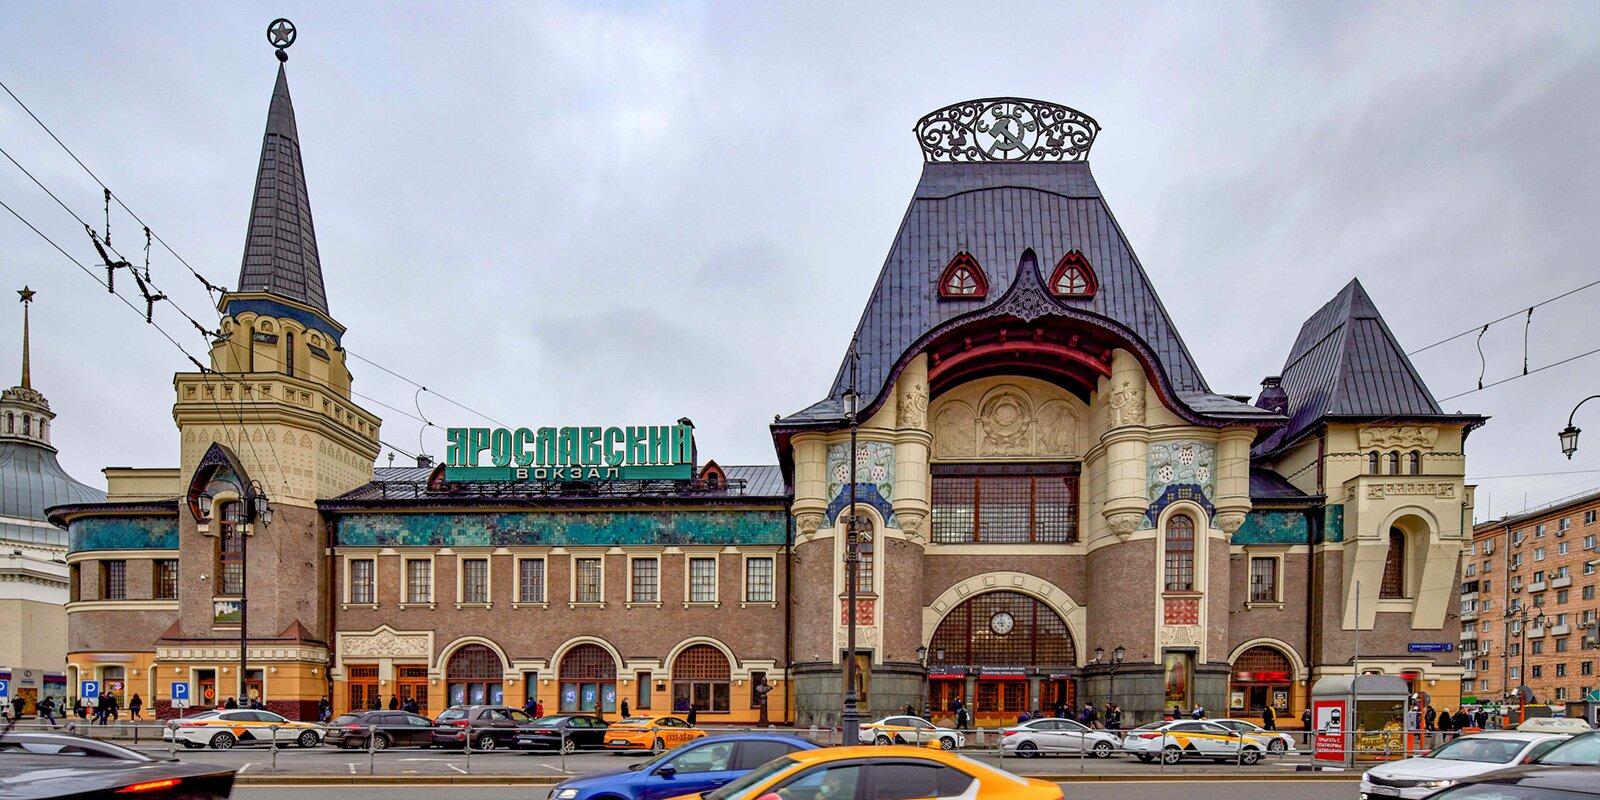 Photo by Maxim Denisov, Mos.ru